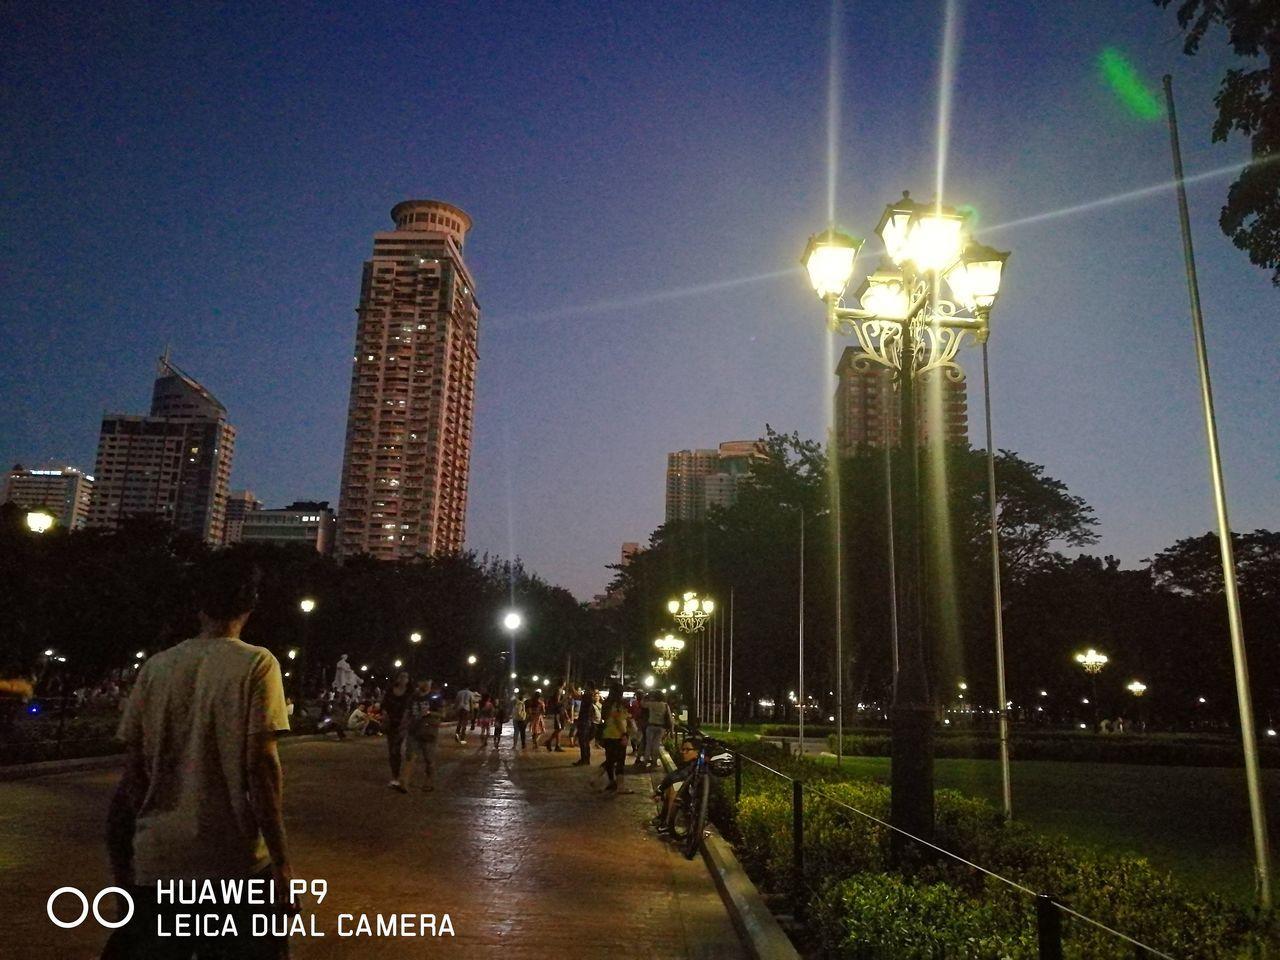 Night Illuminated City Outdoors Huawei Leica Eyeem Philippines Park Lamppost Luneta